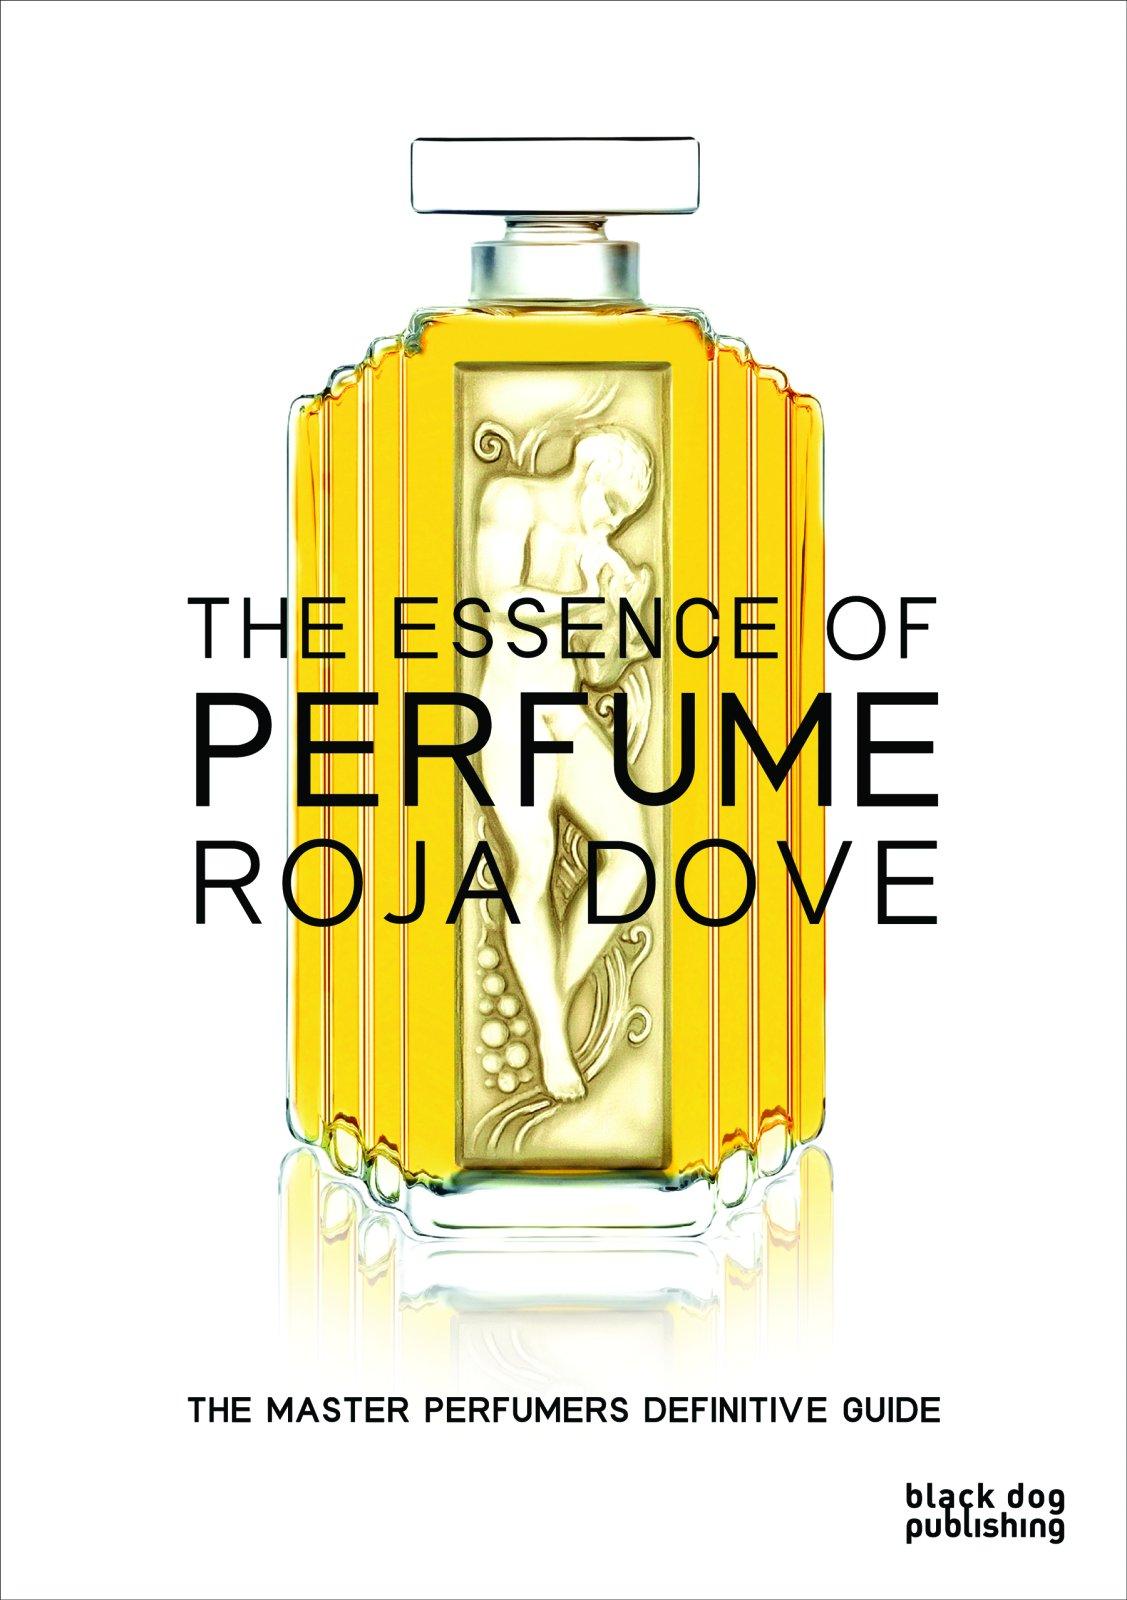 The Essence of Perfume